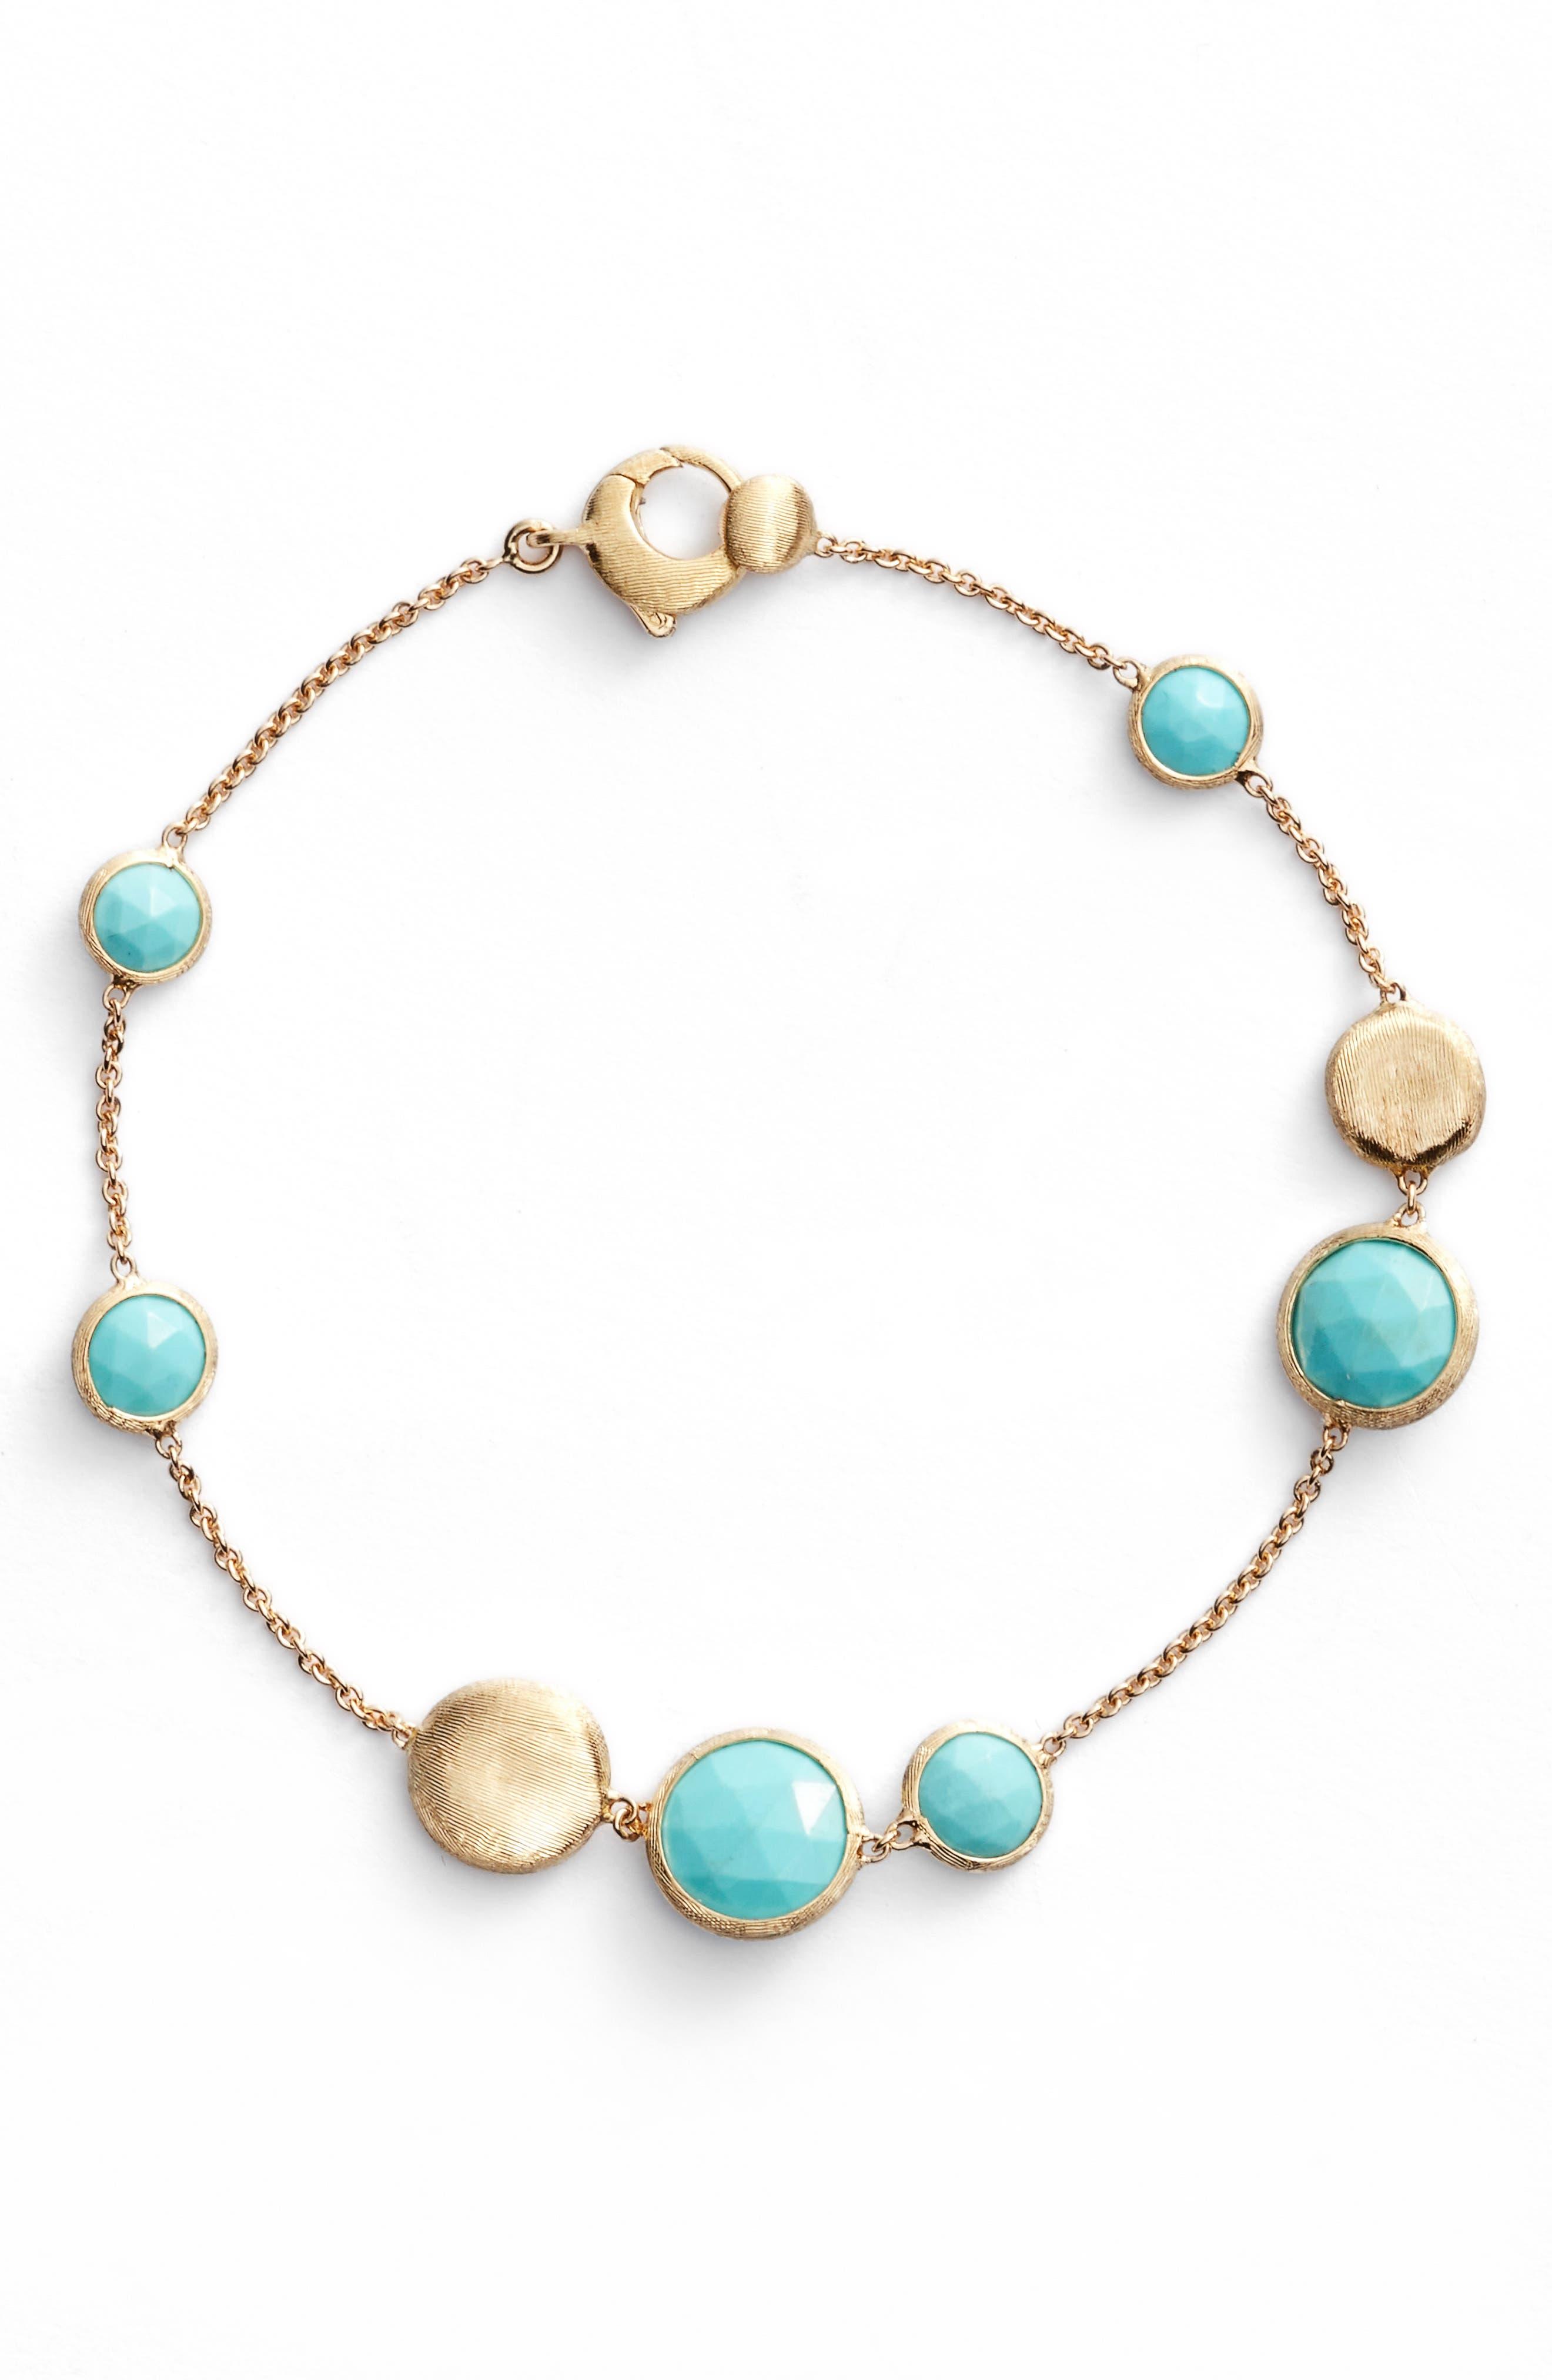 Jaipur Turquoise Bracelet,                             Main thumbnail 1, color,                             701